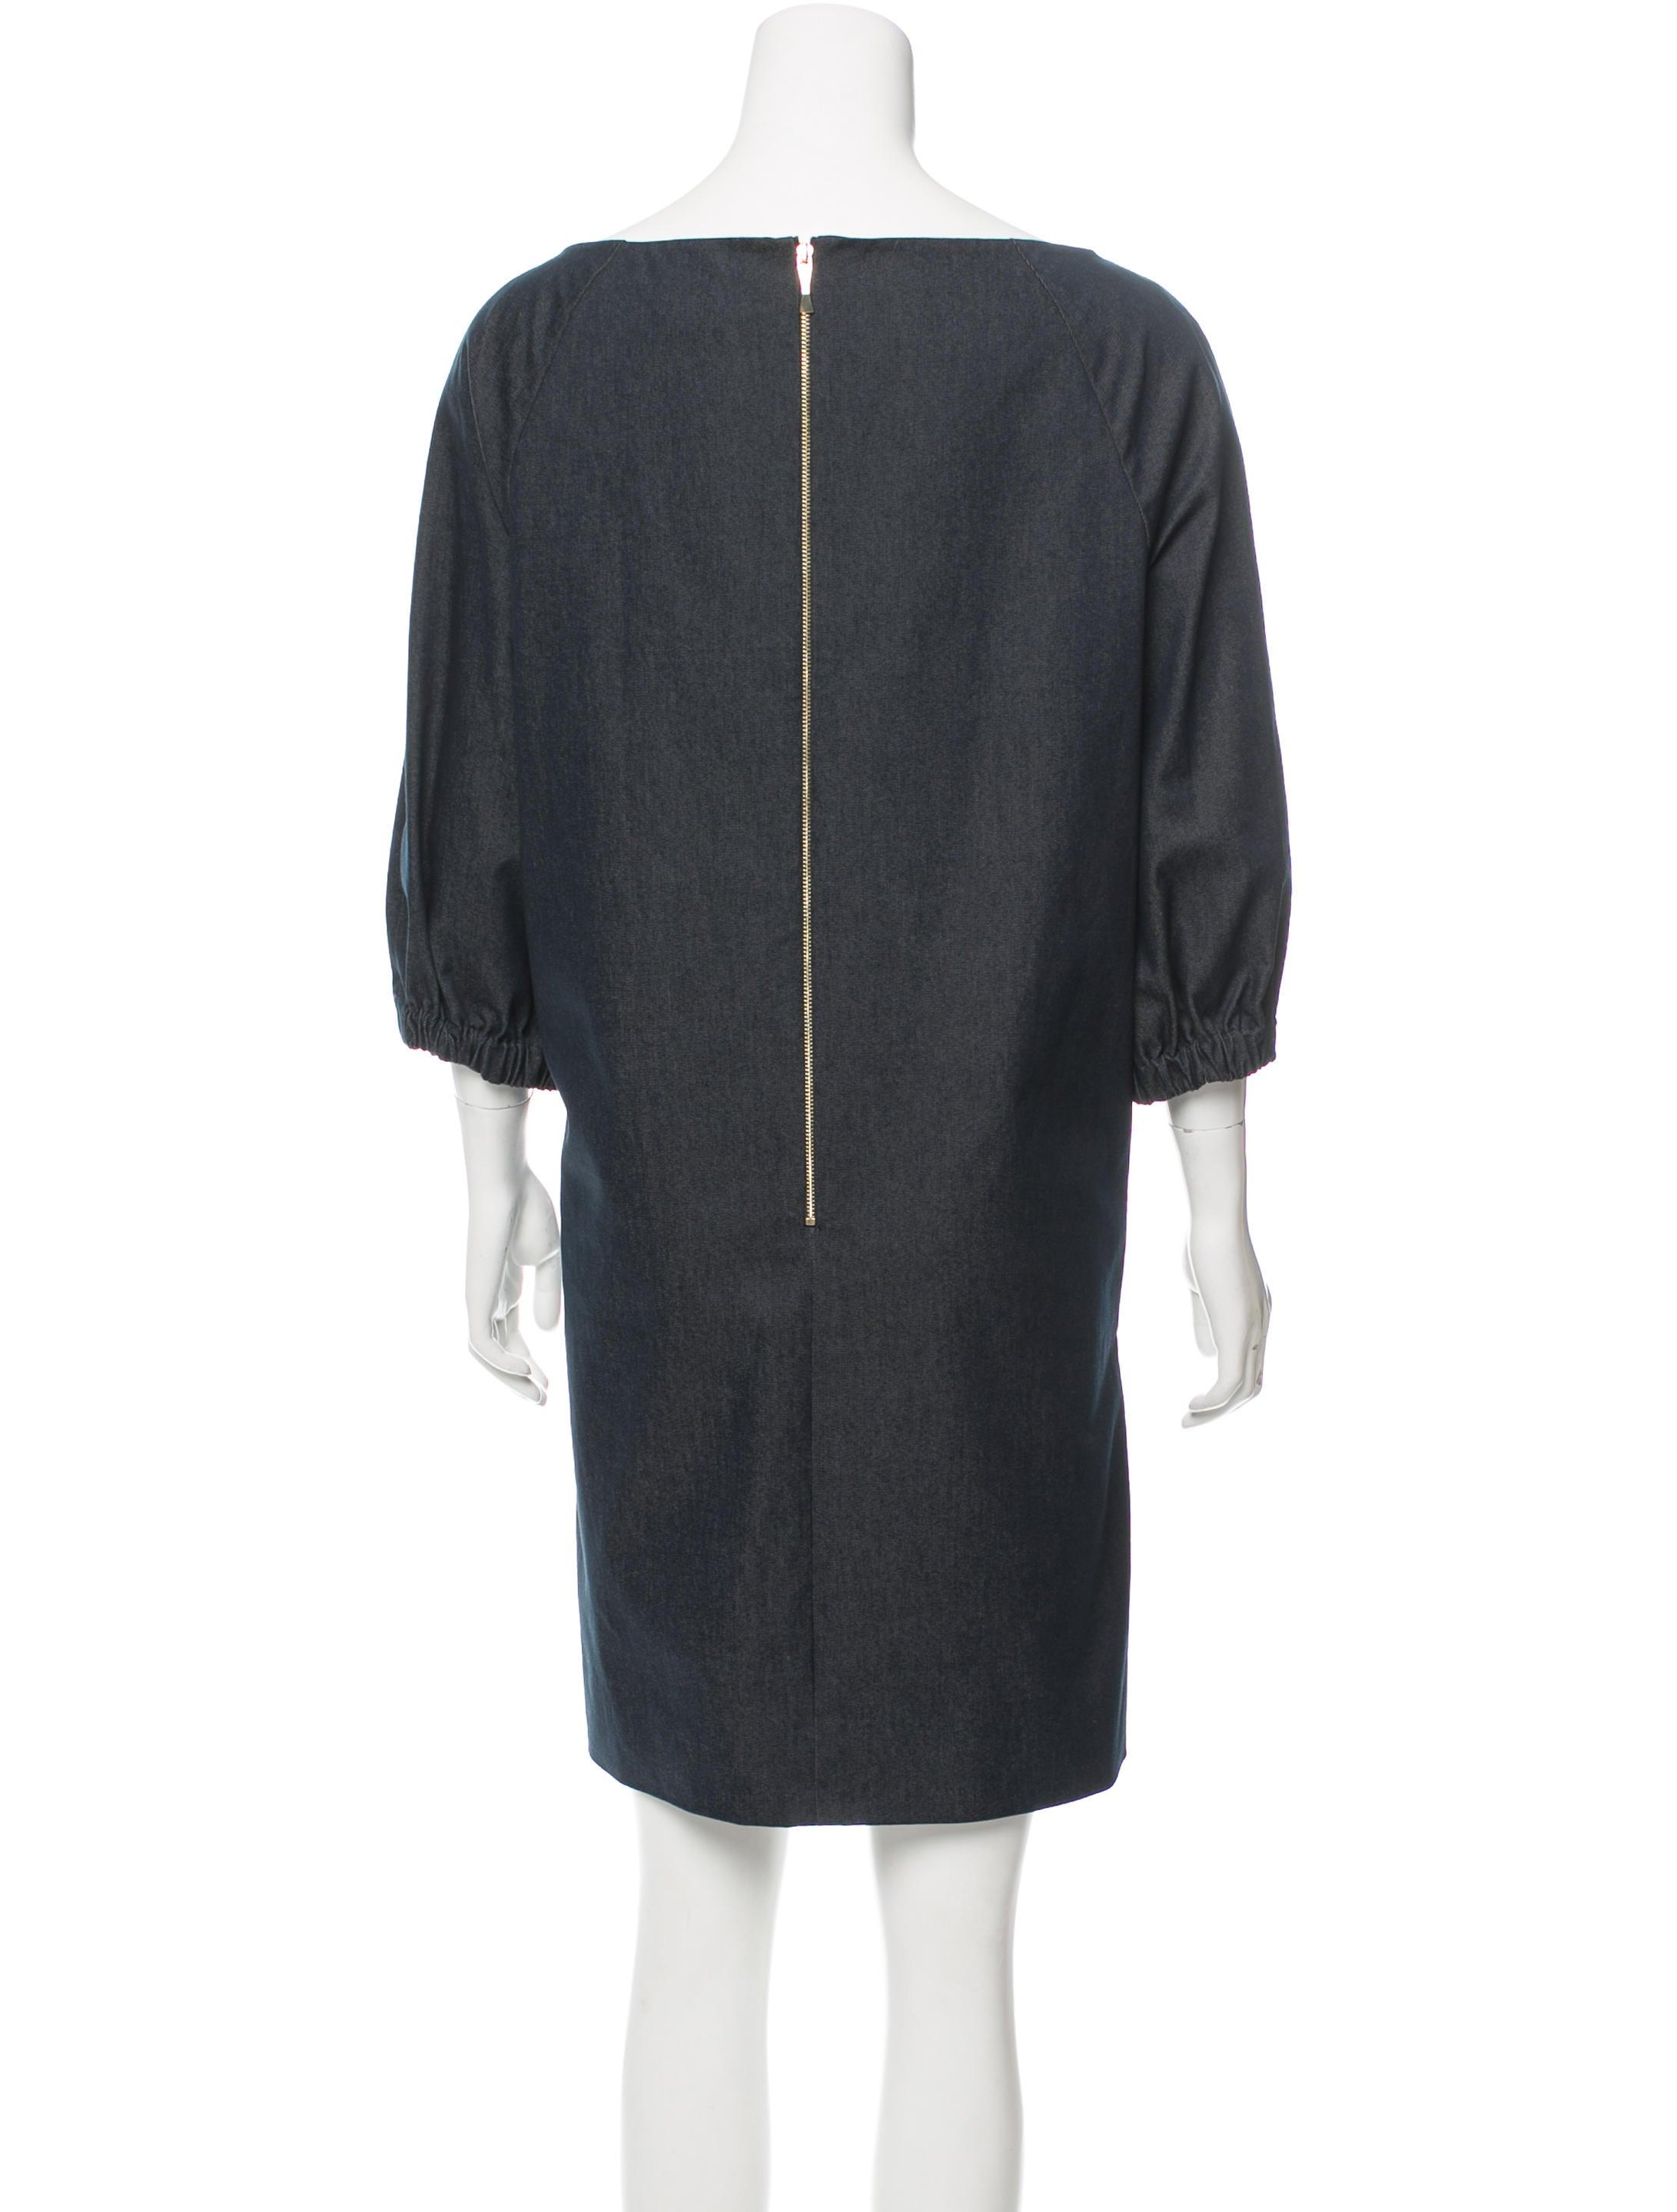 Kate Spade New York Denim Mini Dress Clothing Wka55541